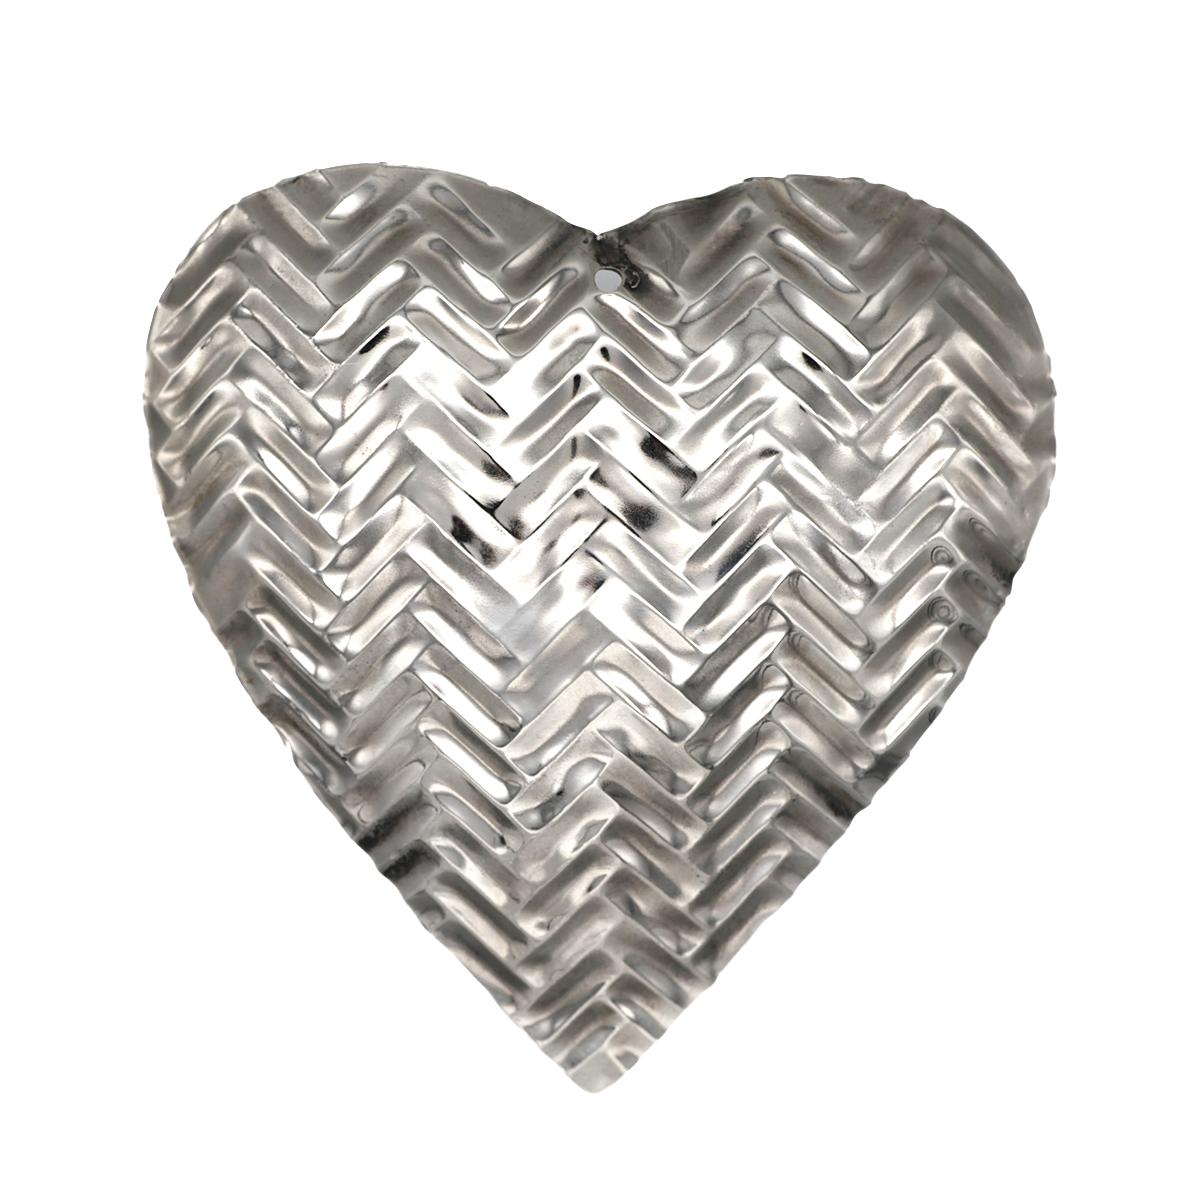 5in Decorative Metal Heart